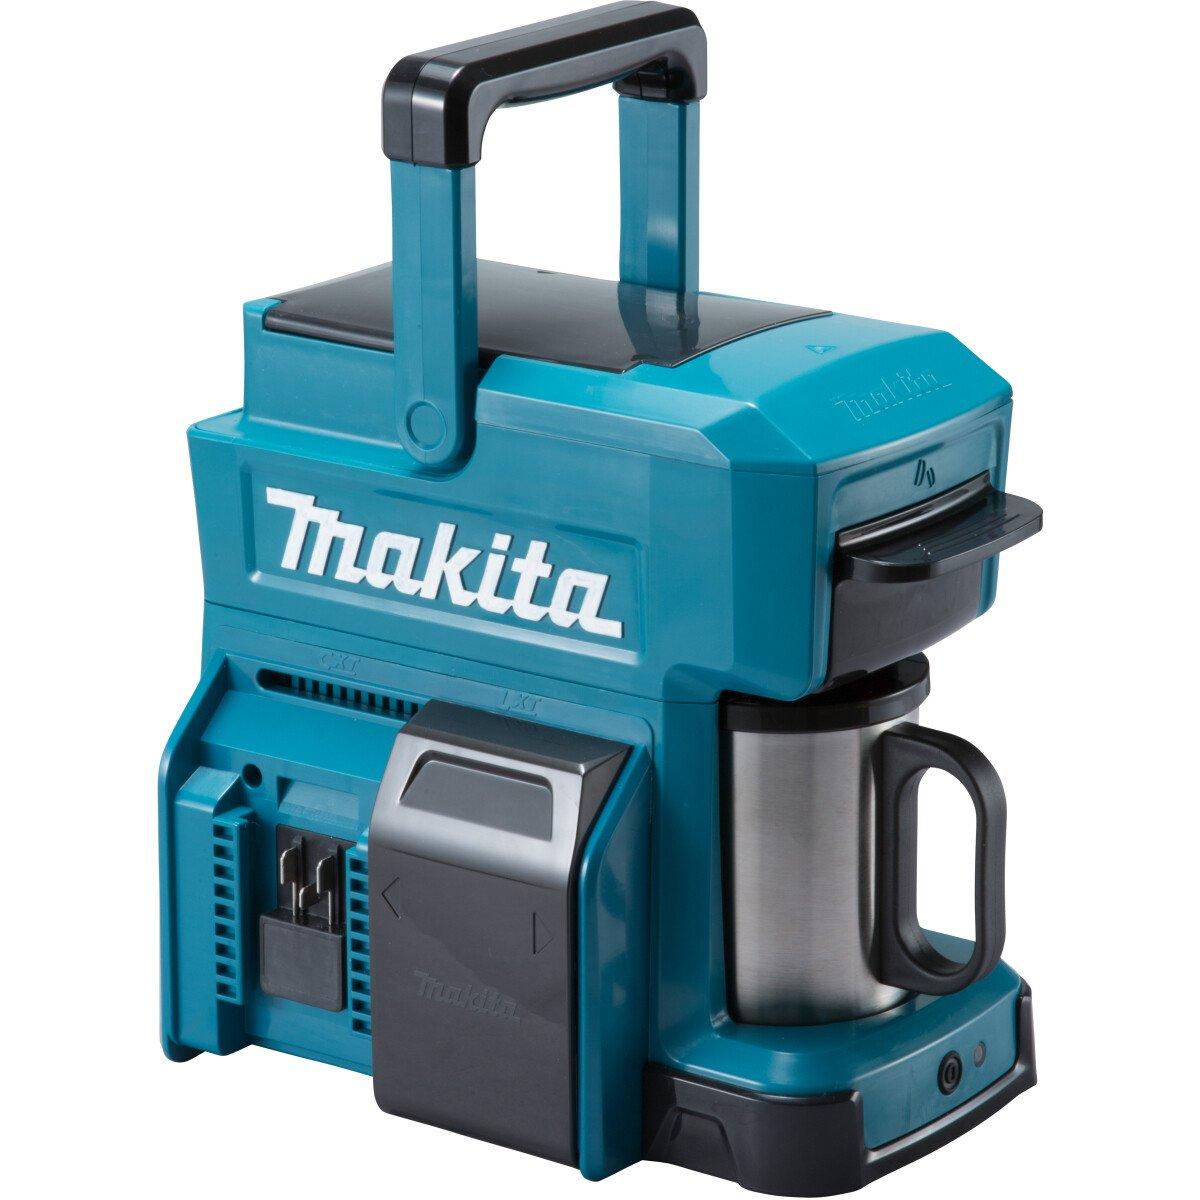 Makita DCM501Z Body Only Cordless Coffee Maker Blue